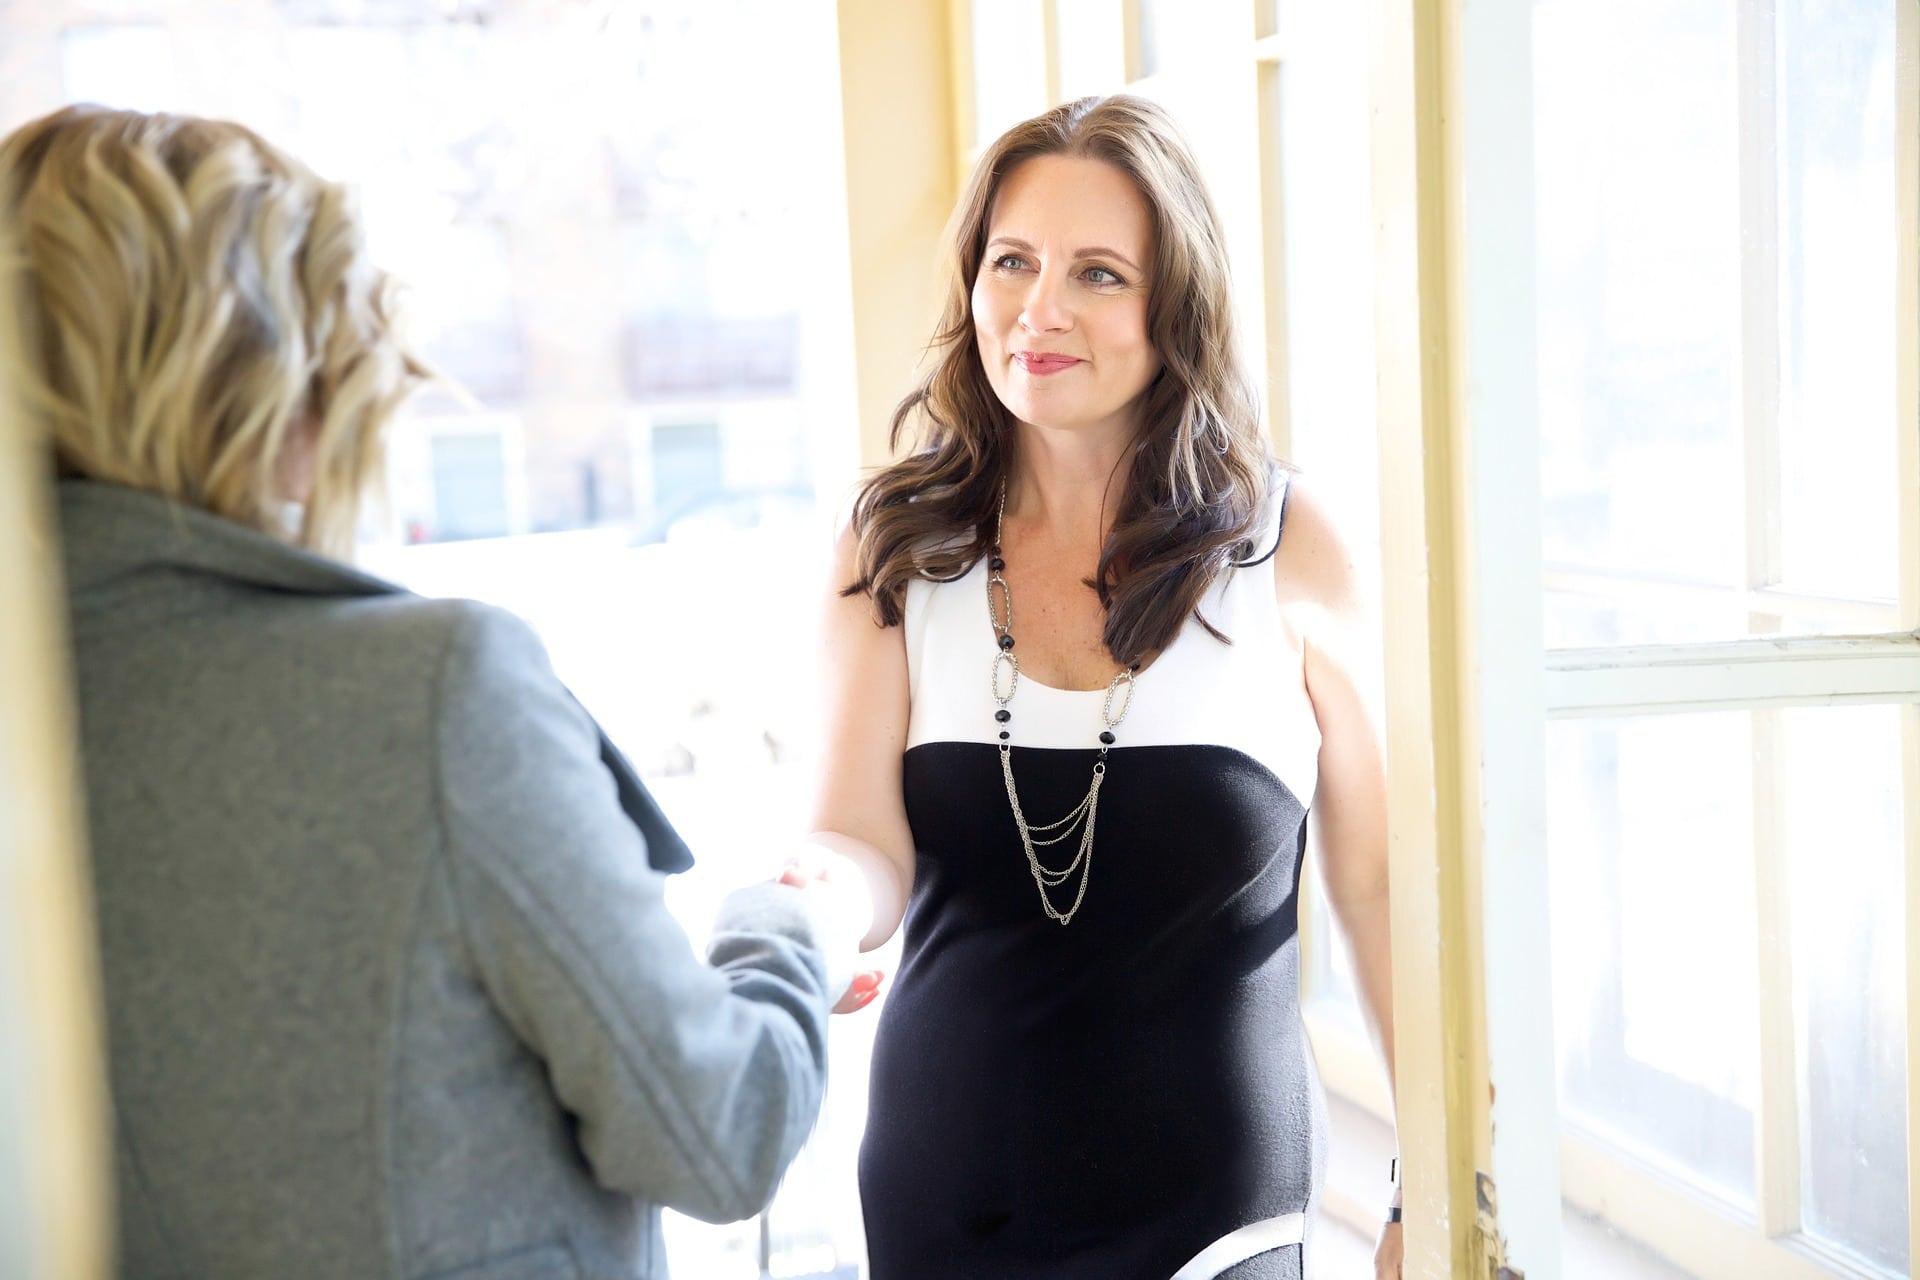 10 common job interview mistakes